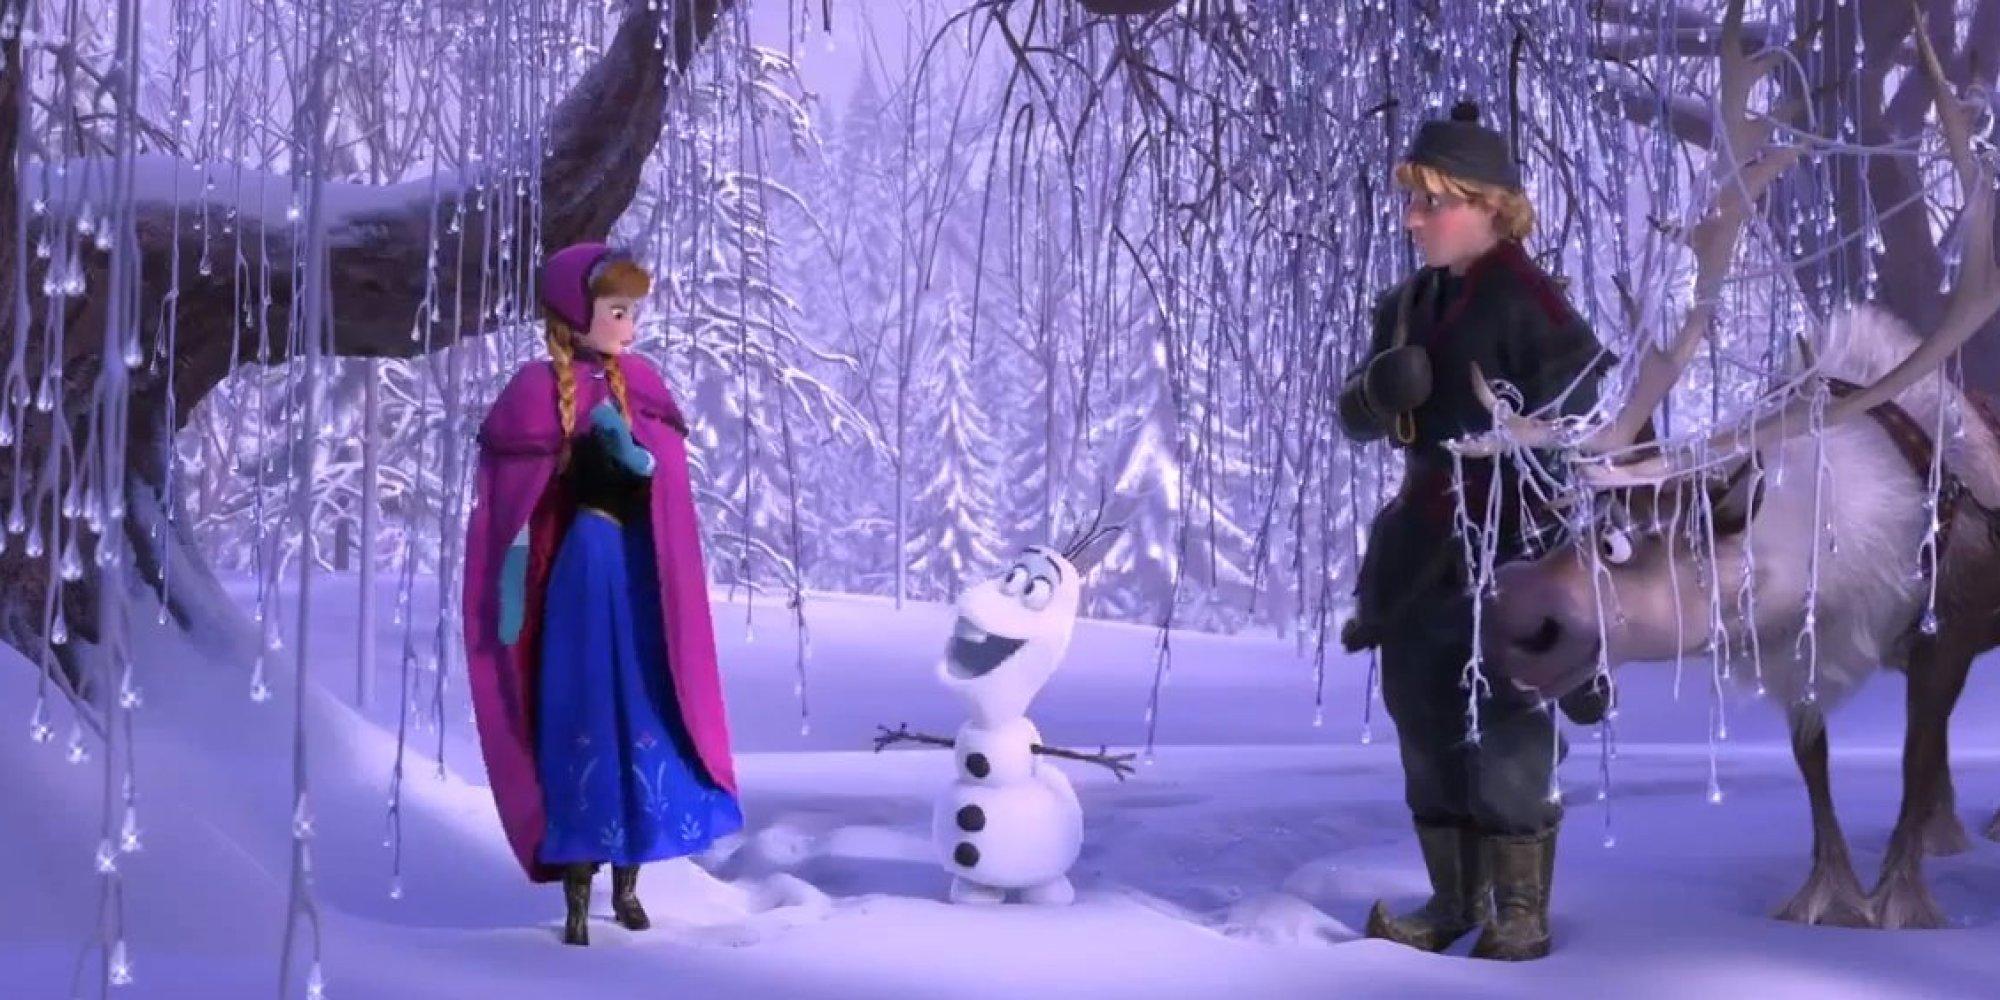 Frozen Snowman Olaf Sings In Summer For Disney Movie